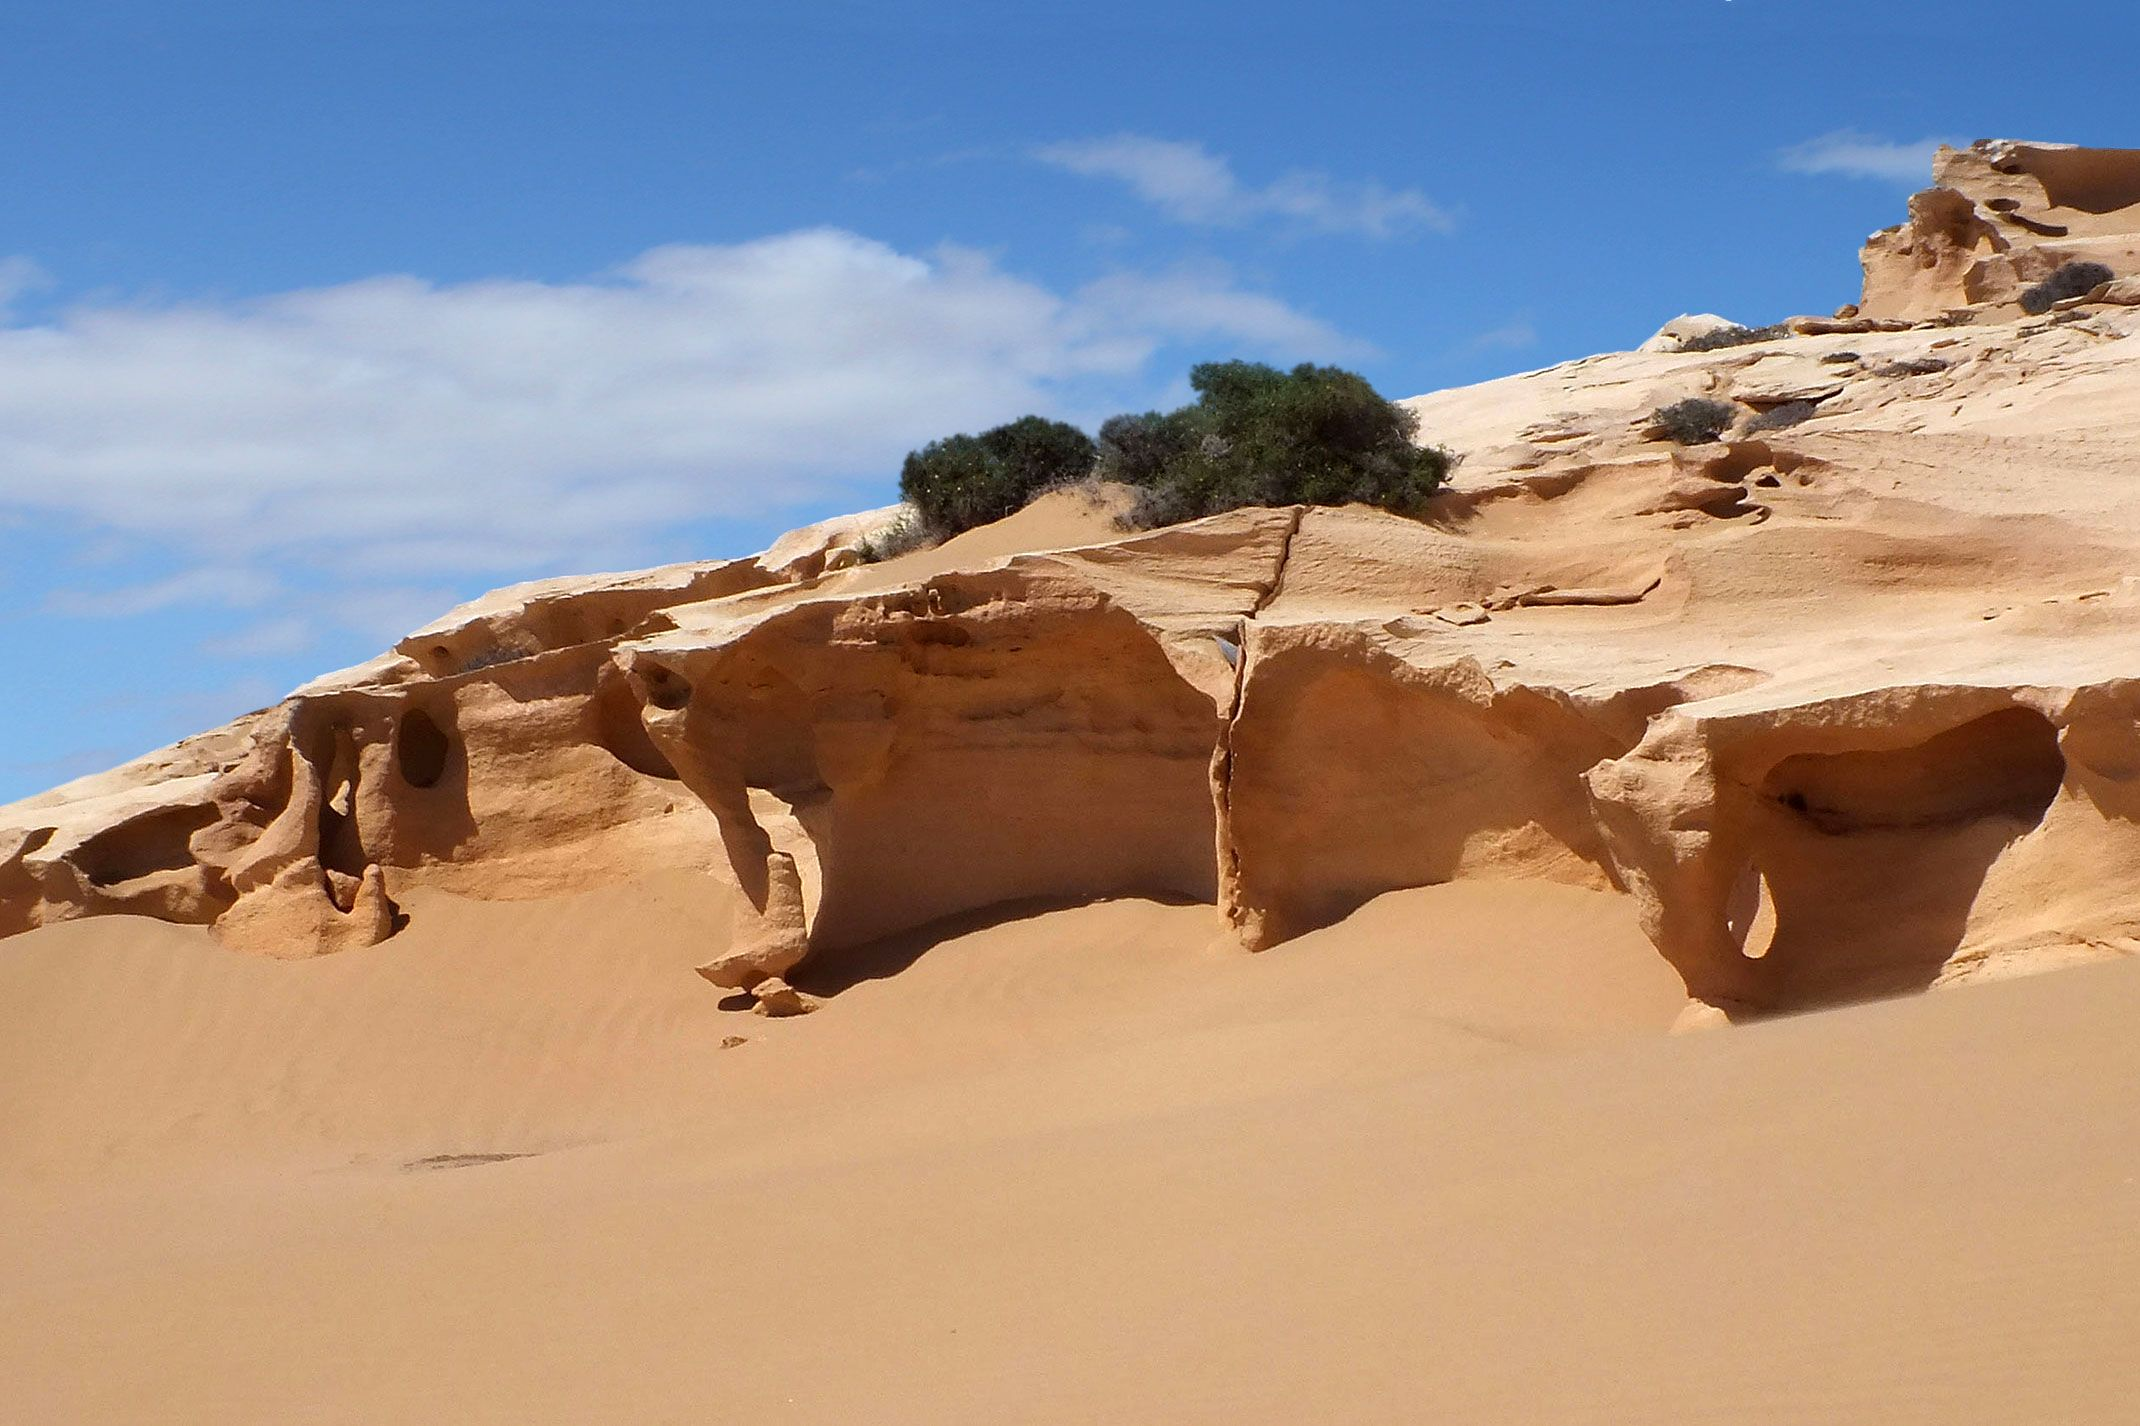 Sahara Zachodnia.piespustyni.pl